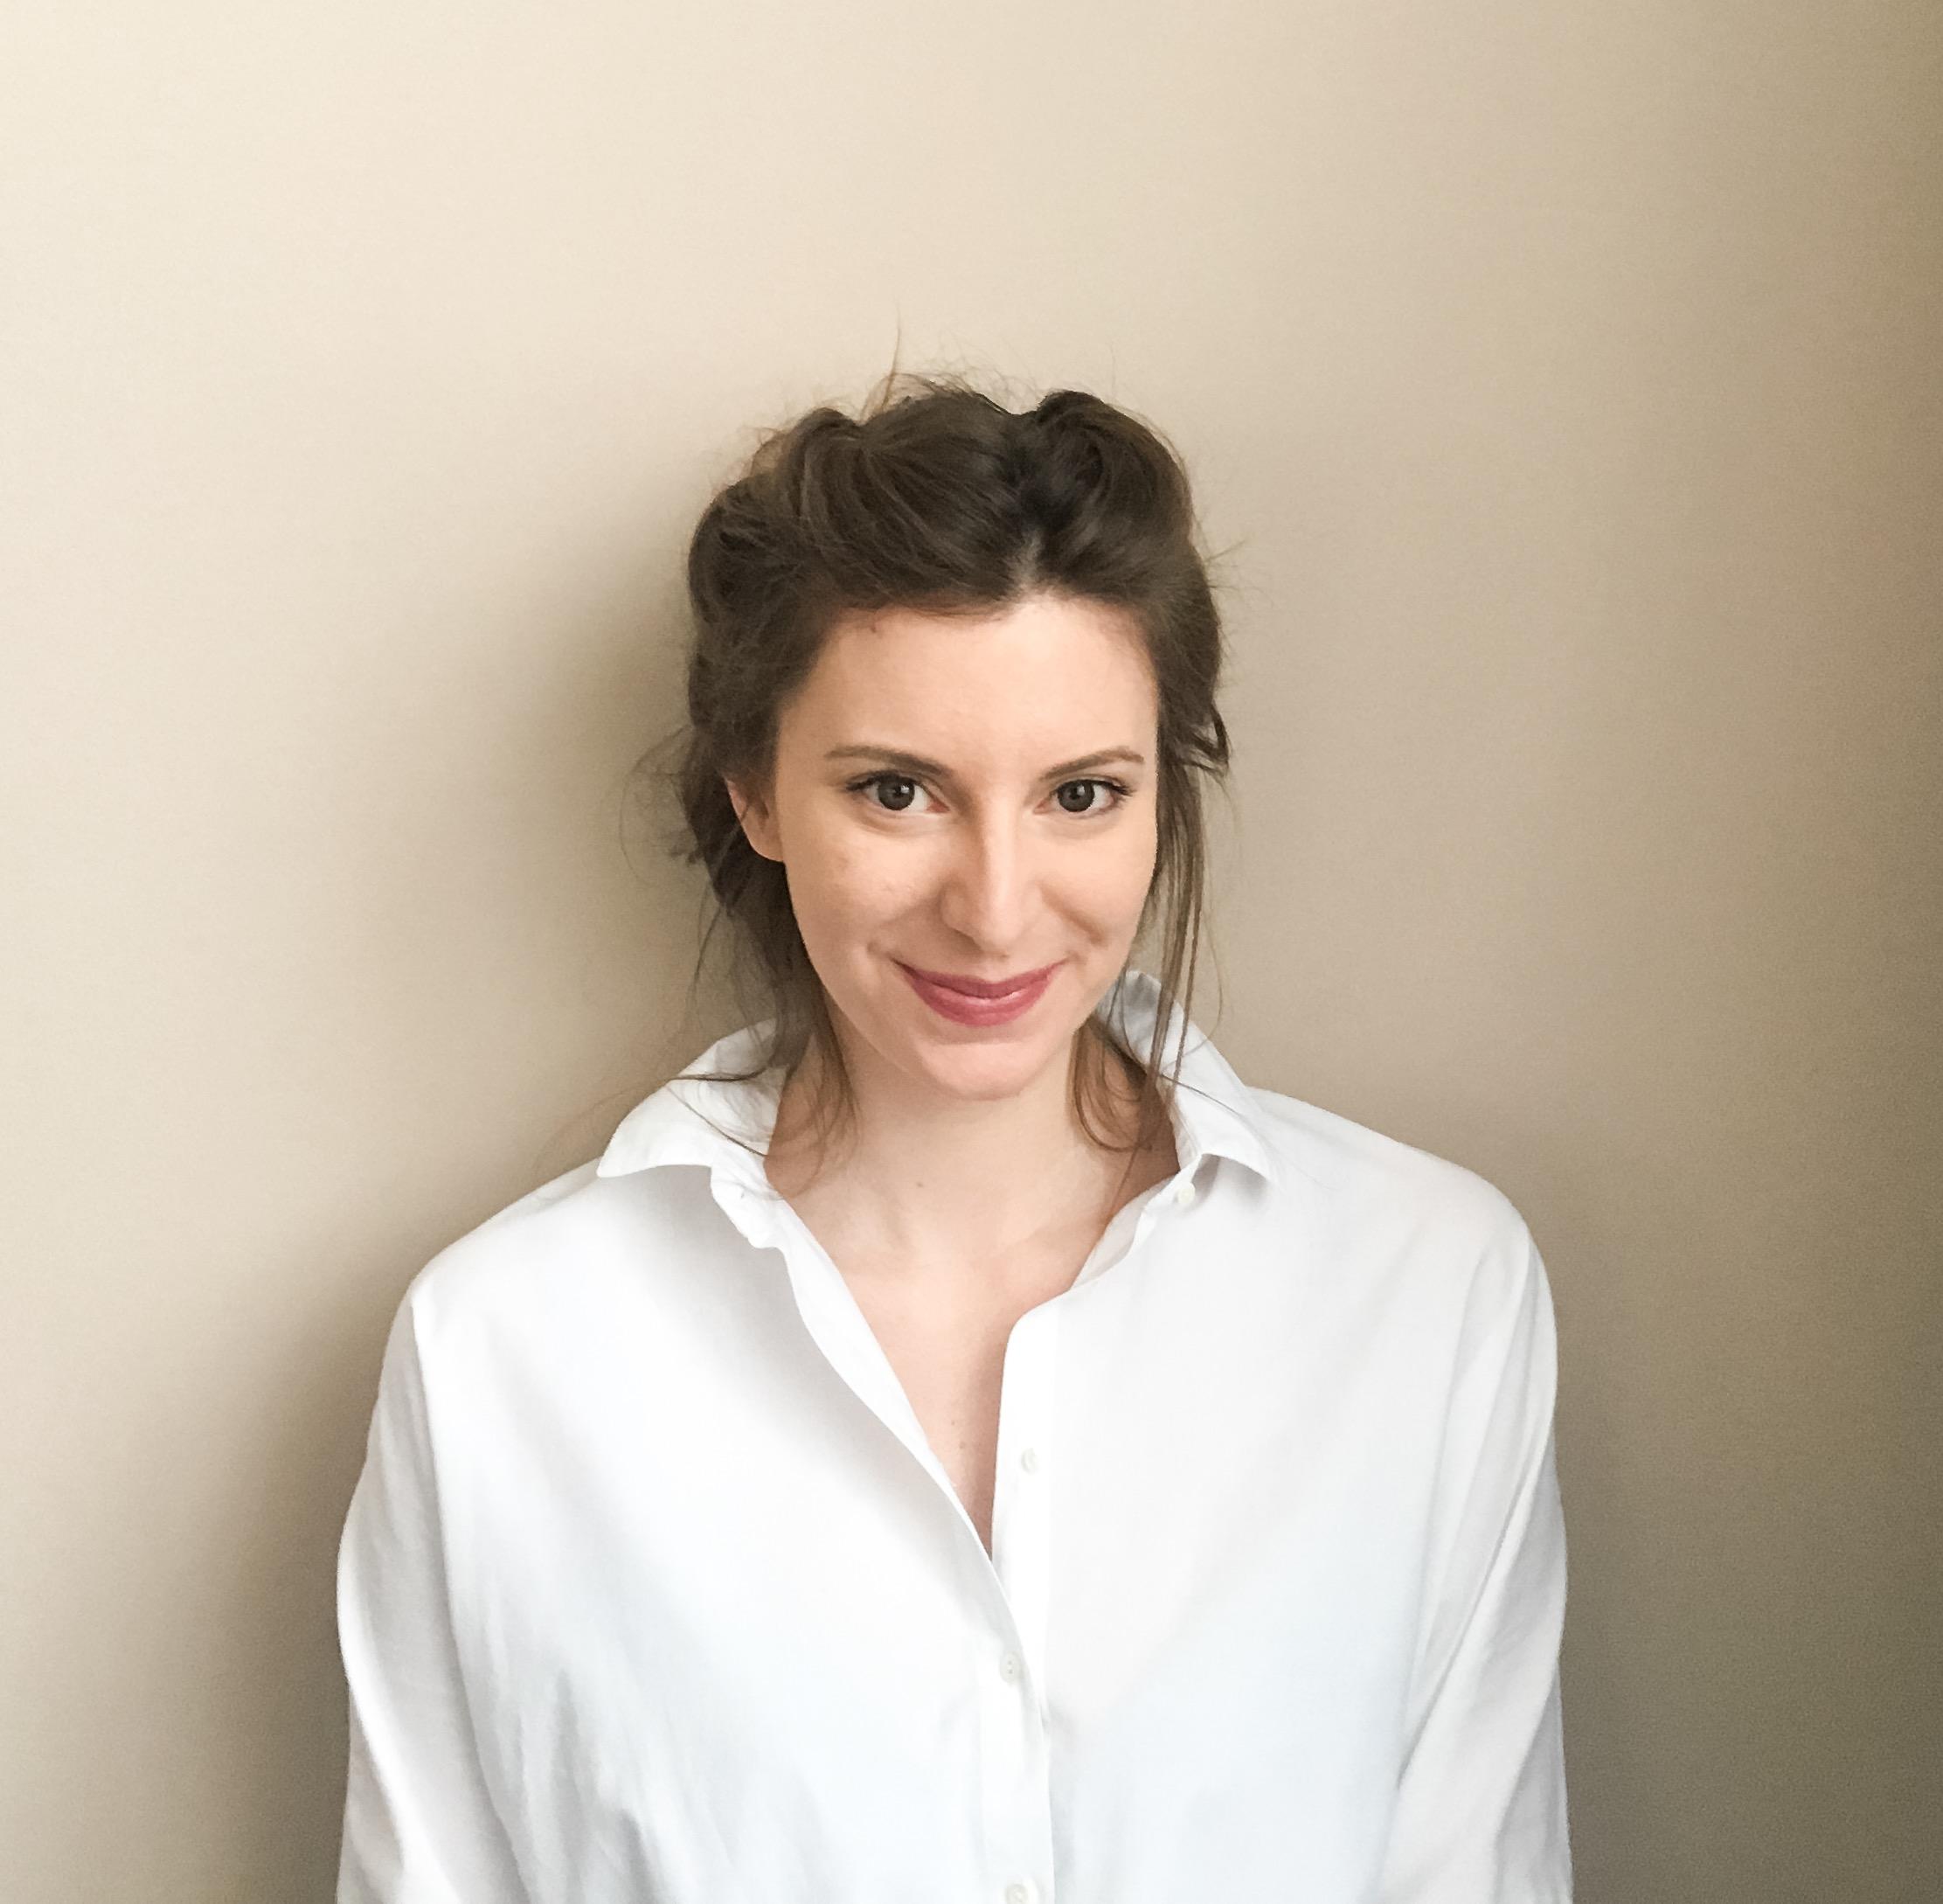 Katarzyna Głogowska IQ ART Agencja Aktorska (1)